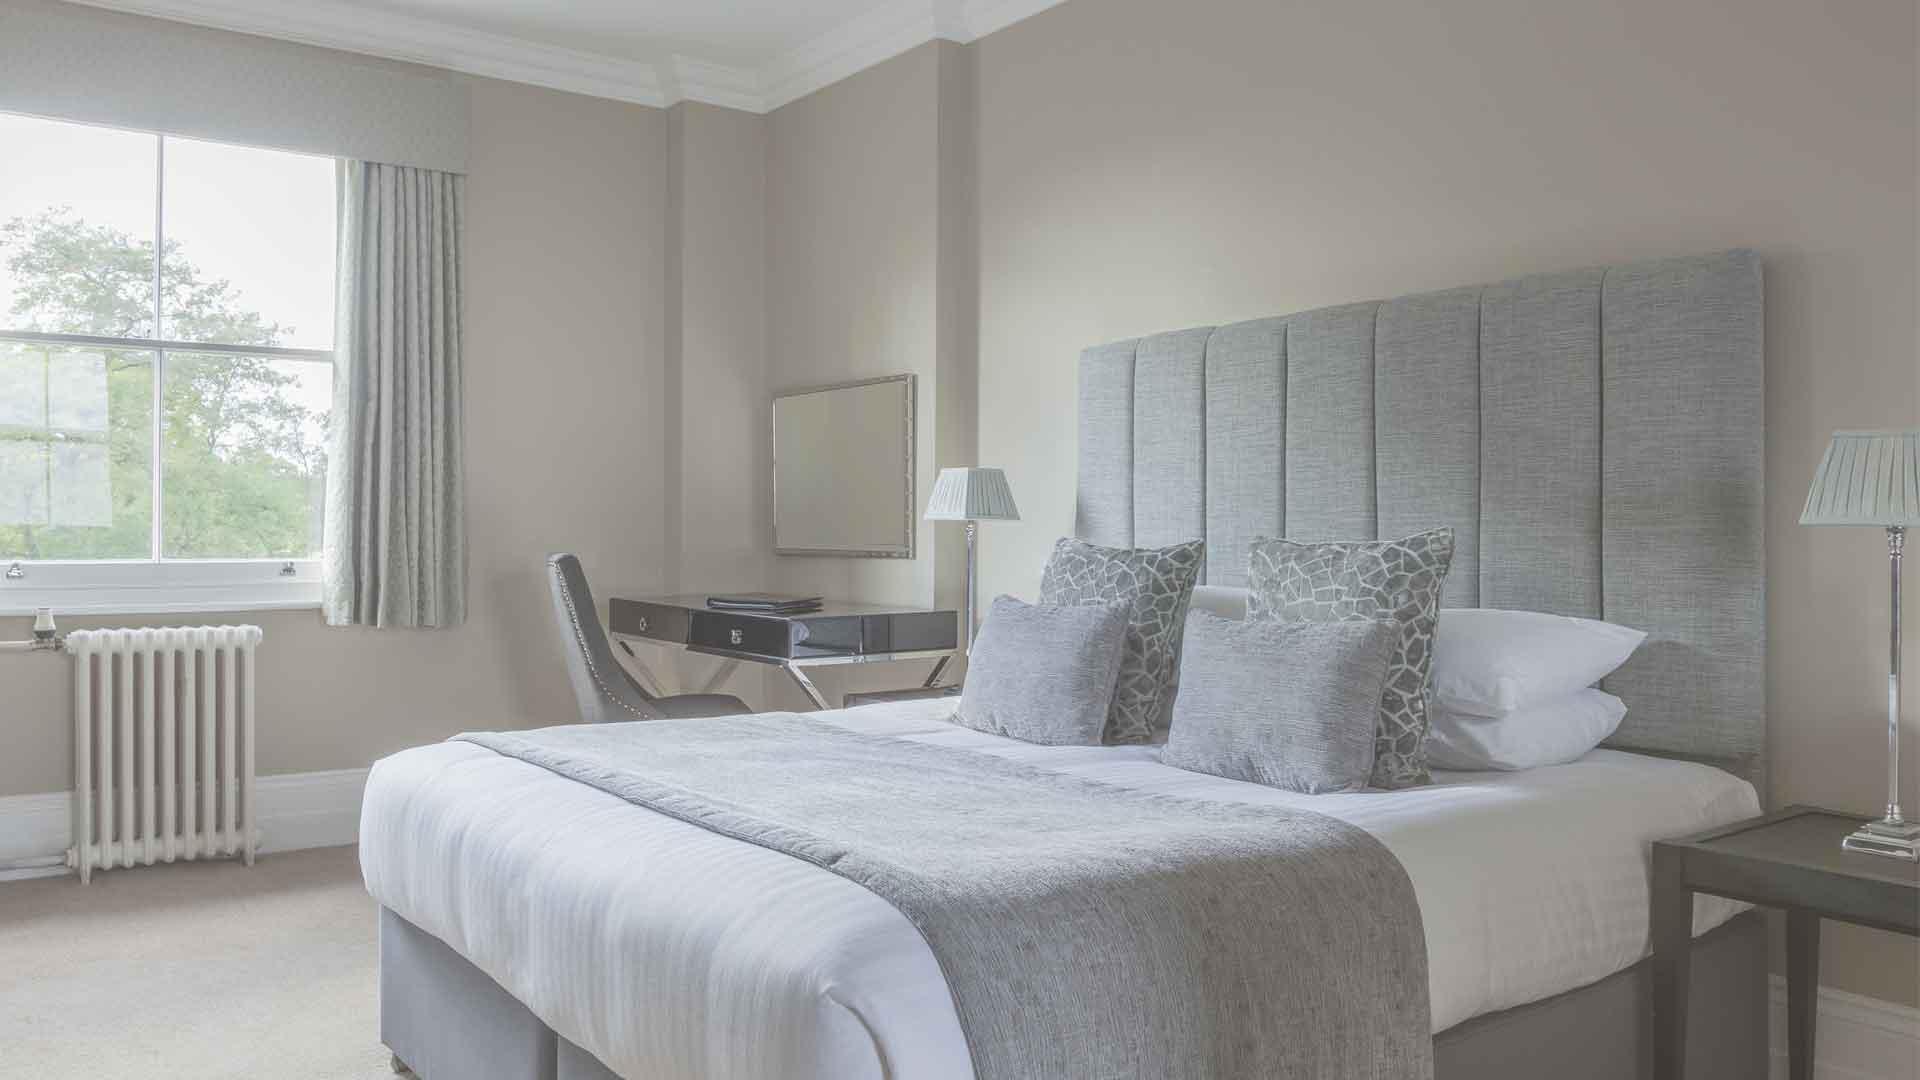 Advance purchase offer at Oatlands Park Hotel